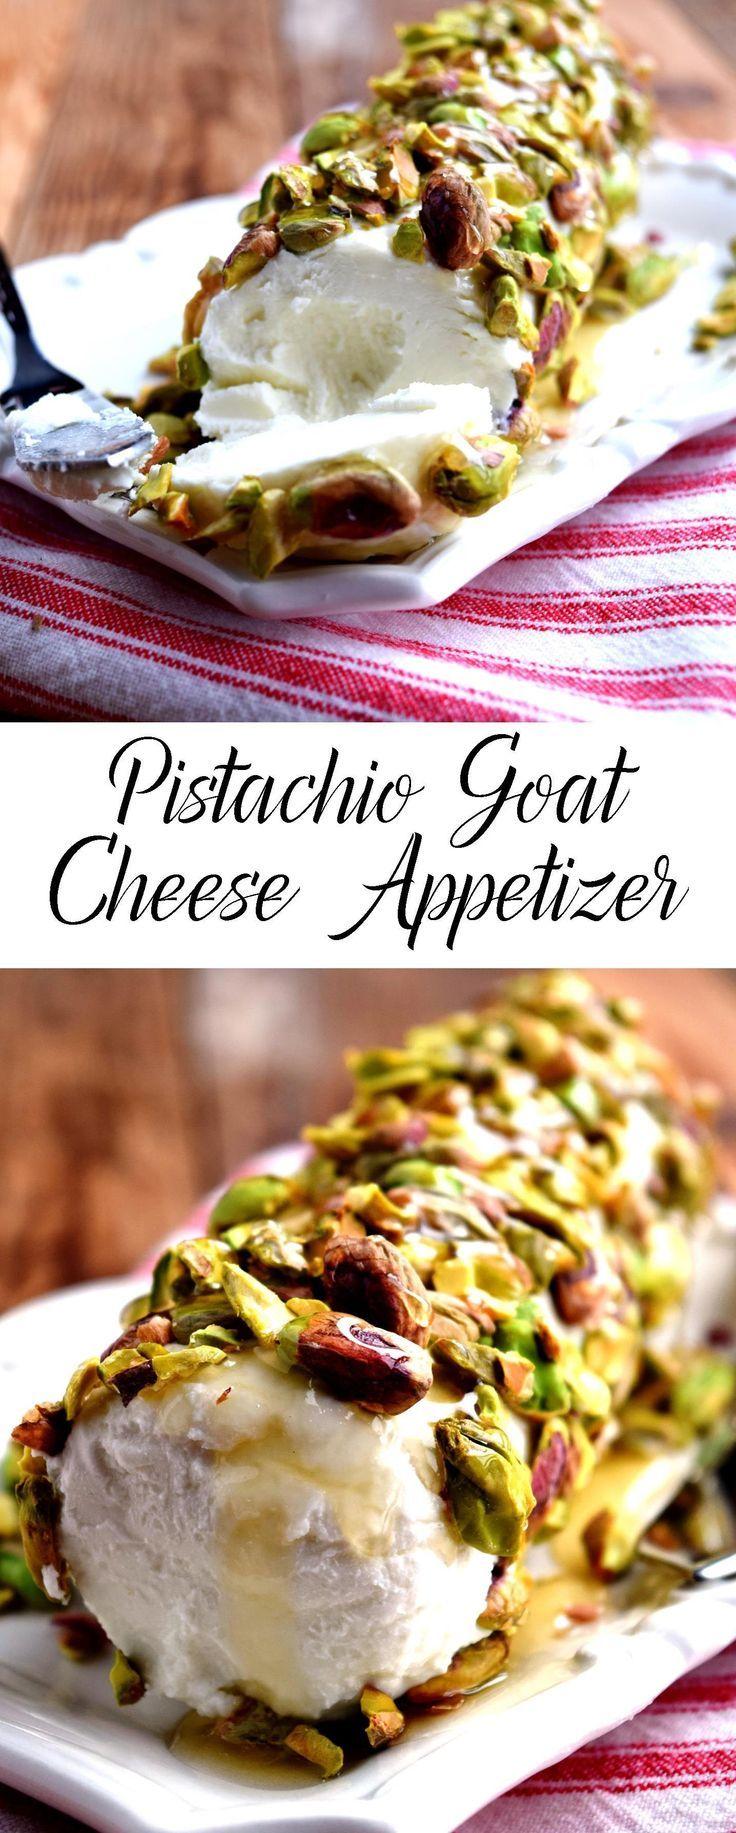 Pistachio Goat Cheese Appetizer